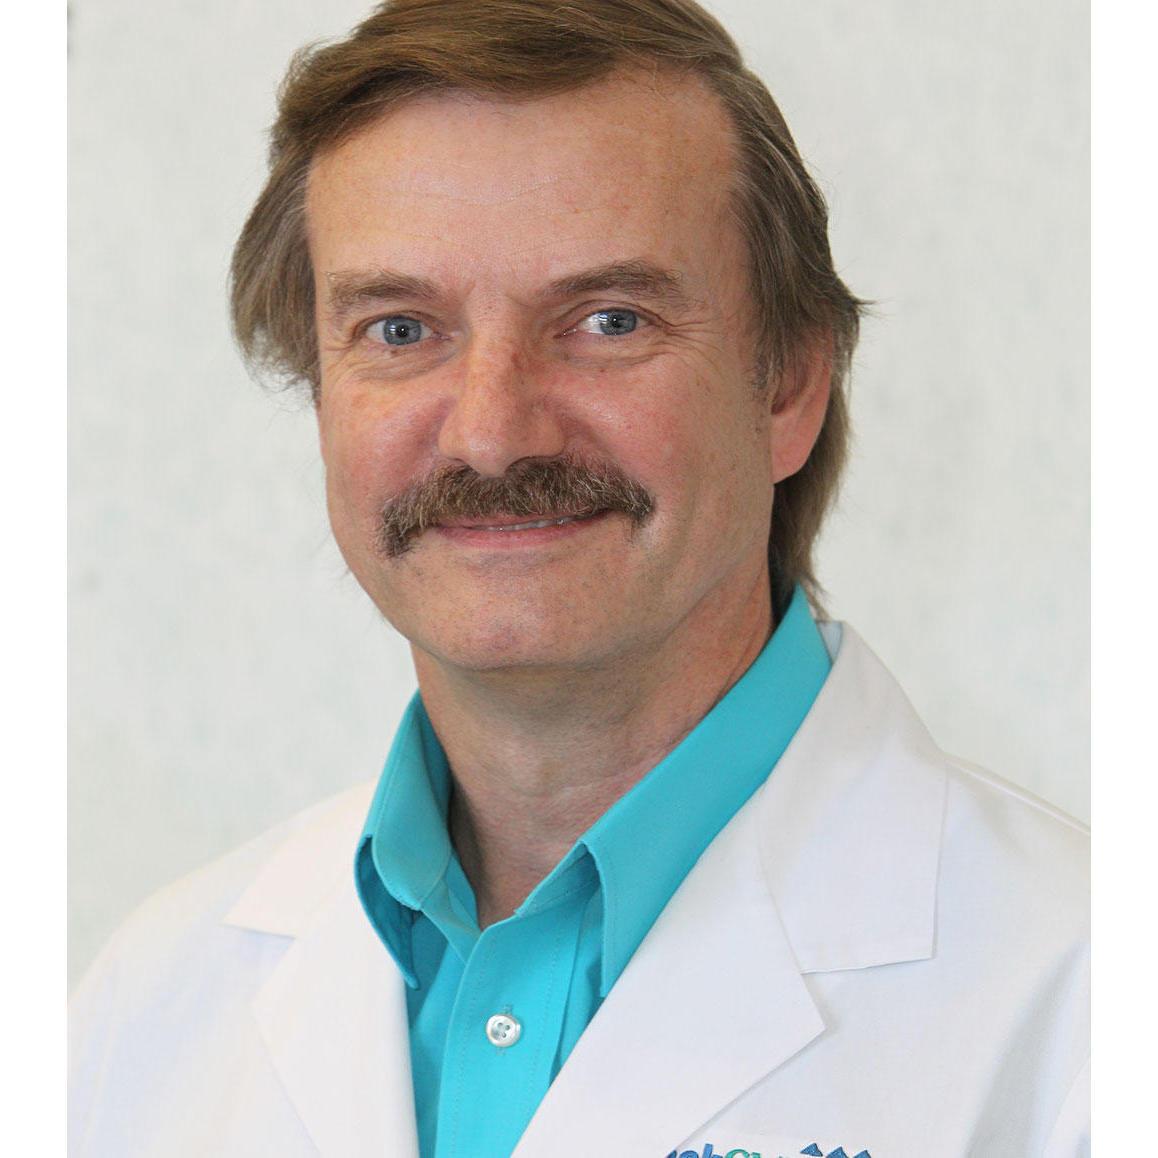 Bruce Eckel MD